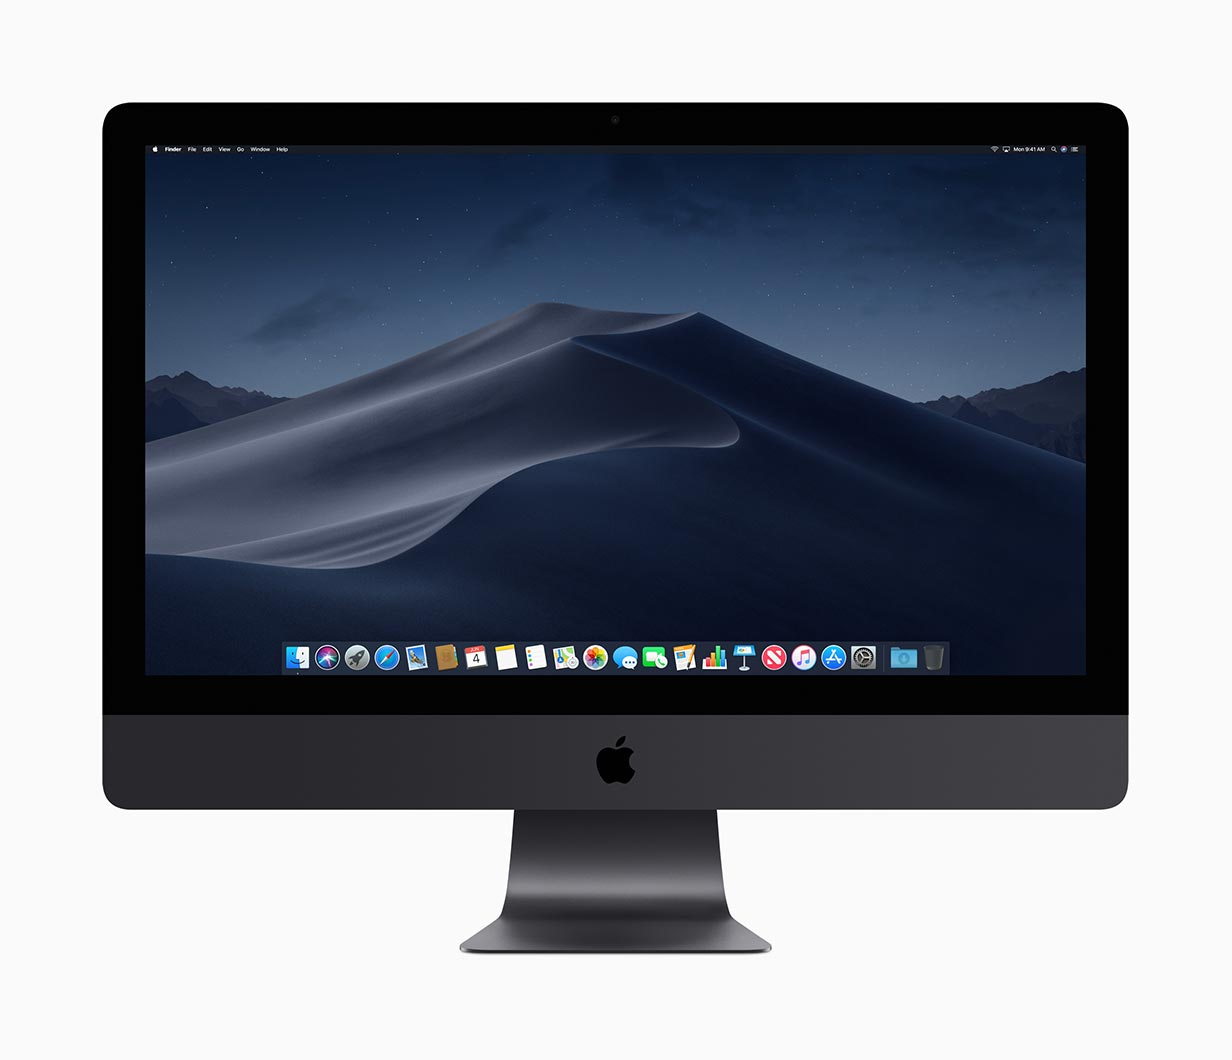 Apple、Mac向けに「macOS Mojave 10.14.4」リリース ー AirPods(第2世代)対応など